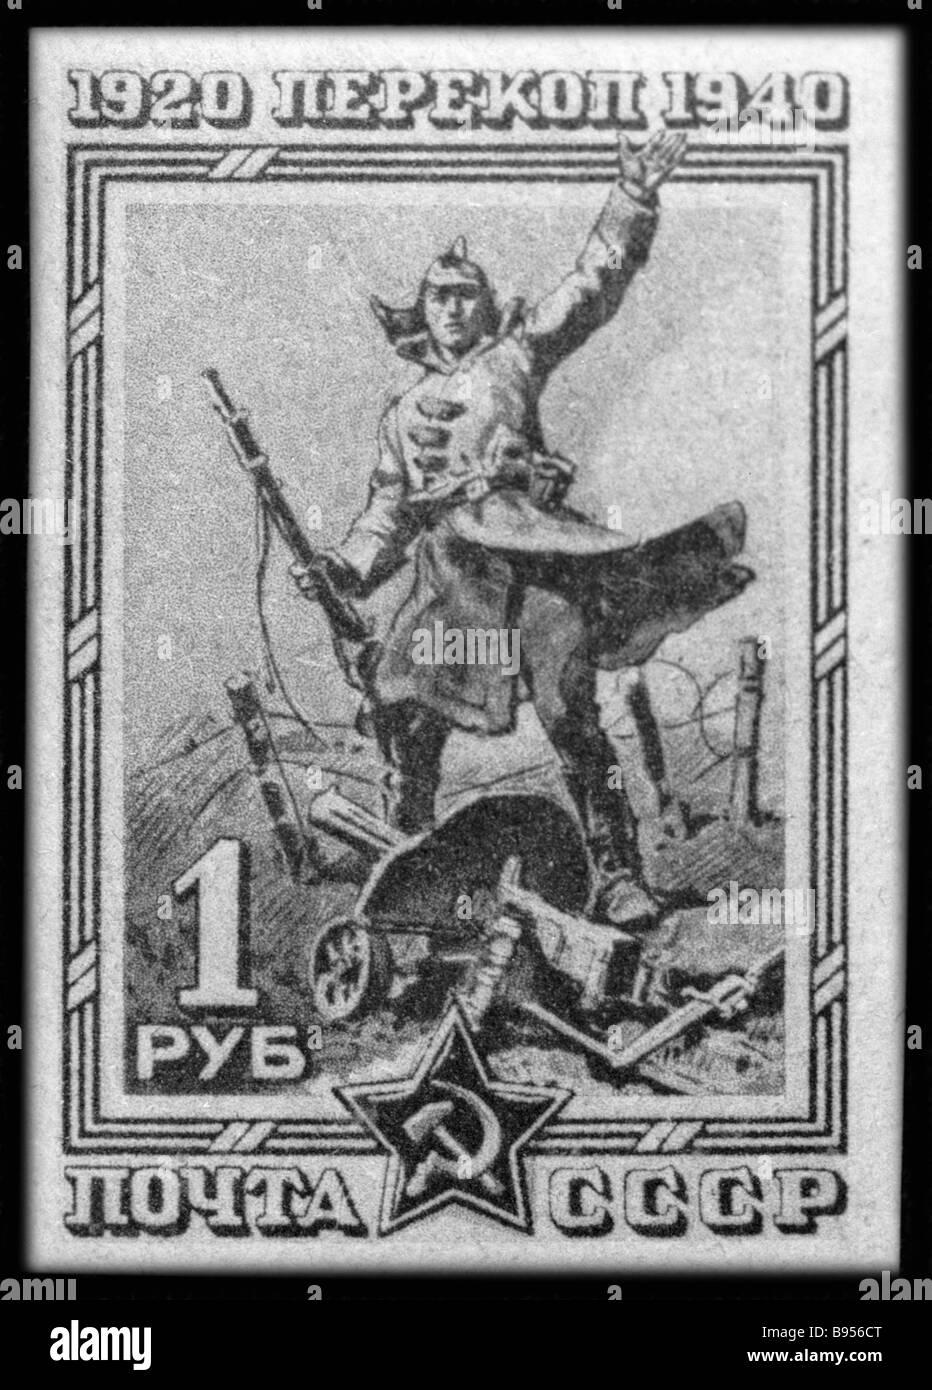 1940 Soviet postal stamp dedicated to the Civil War - Stock Image